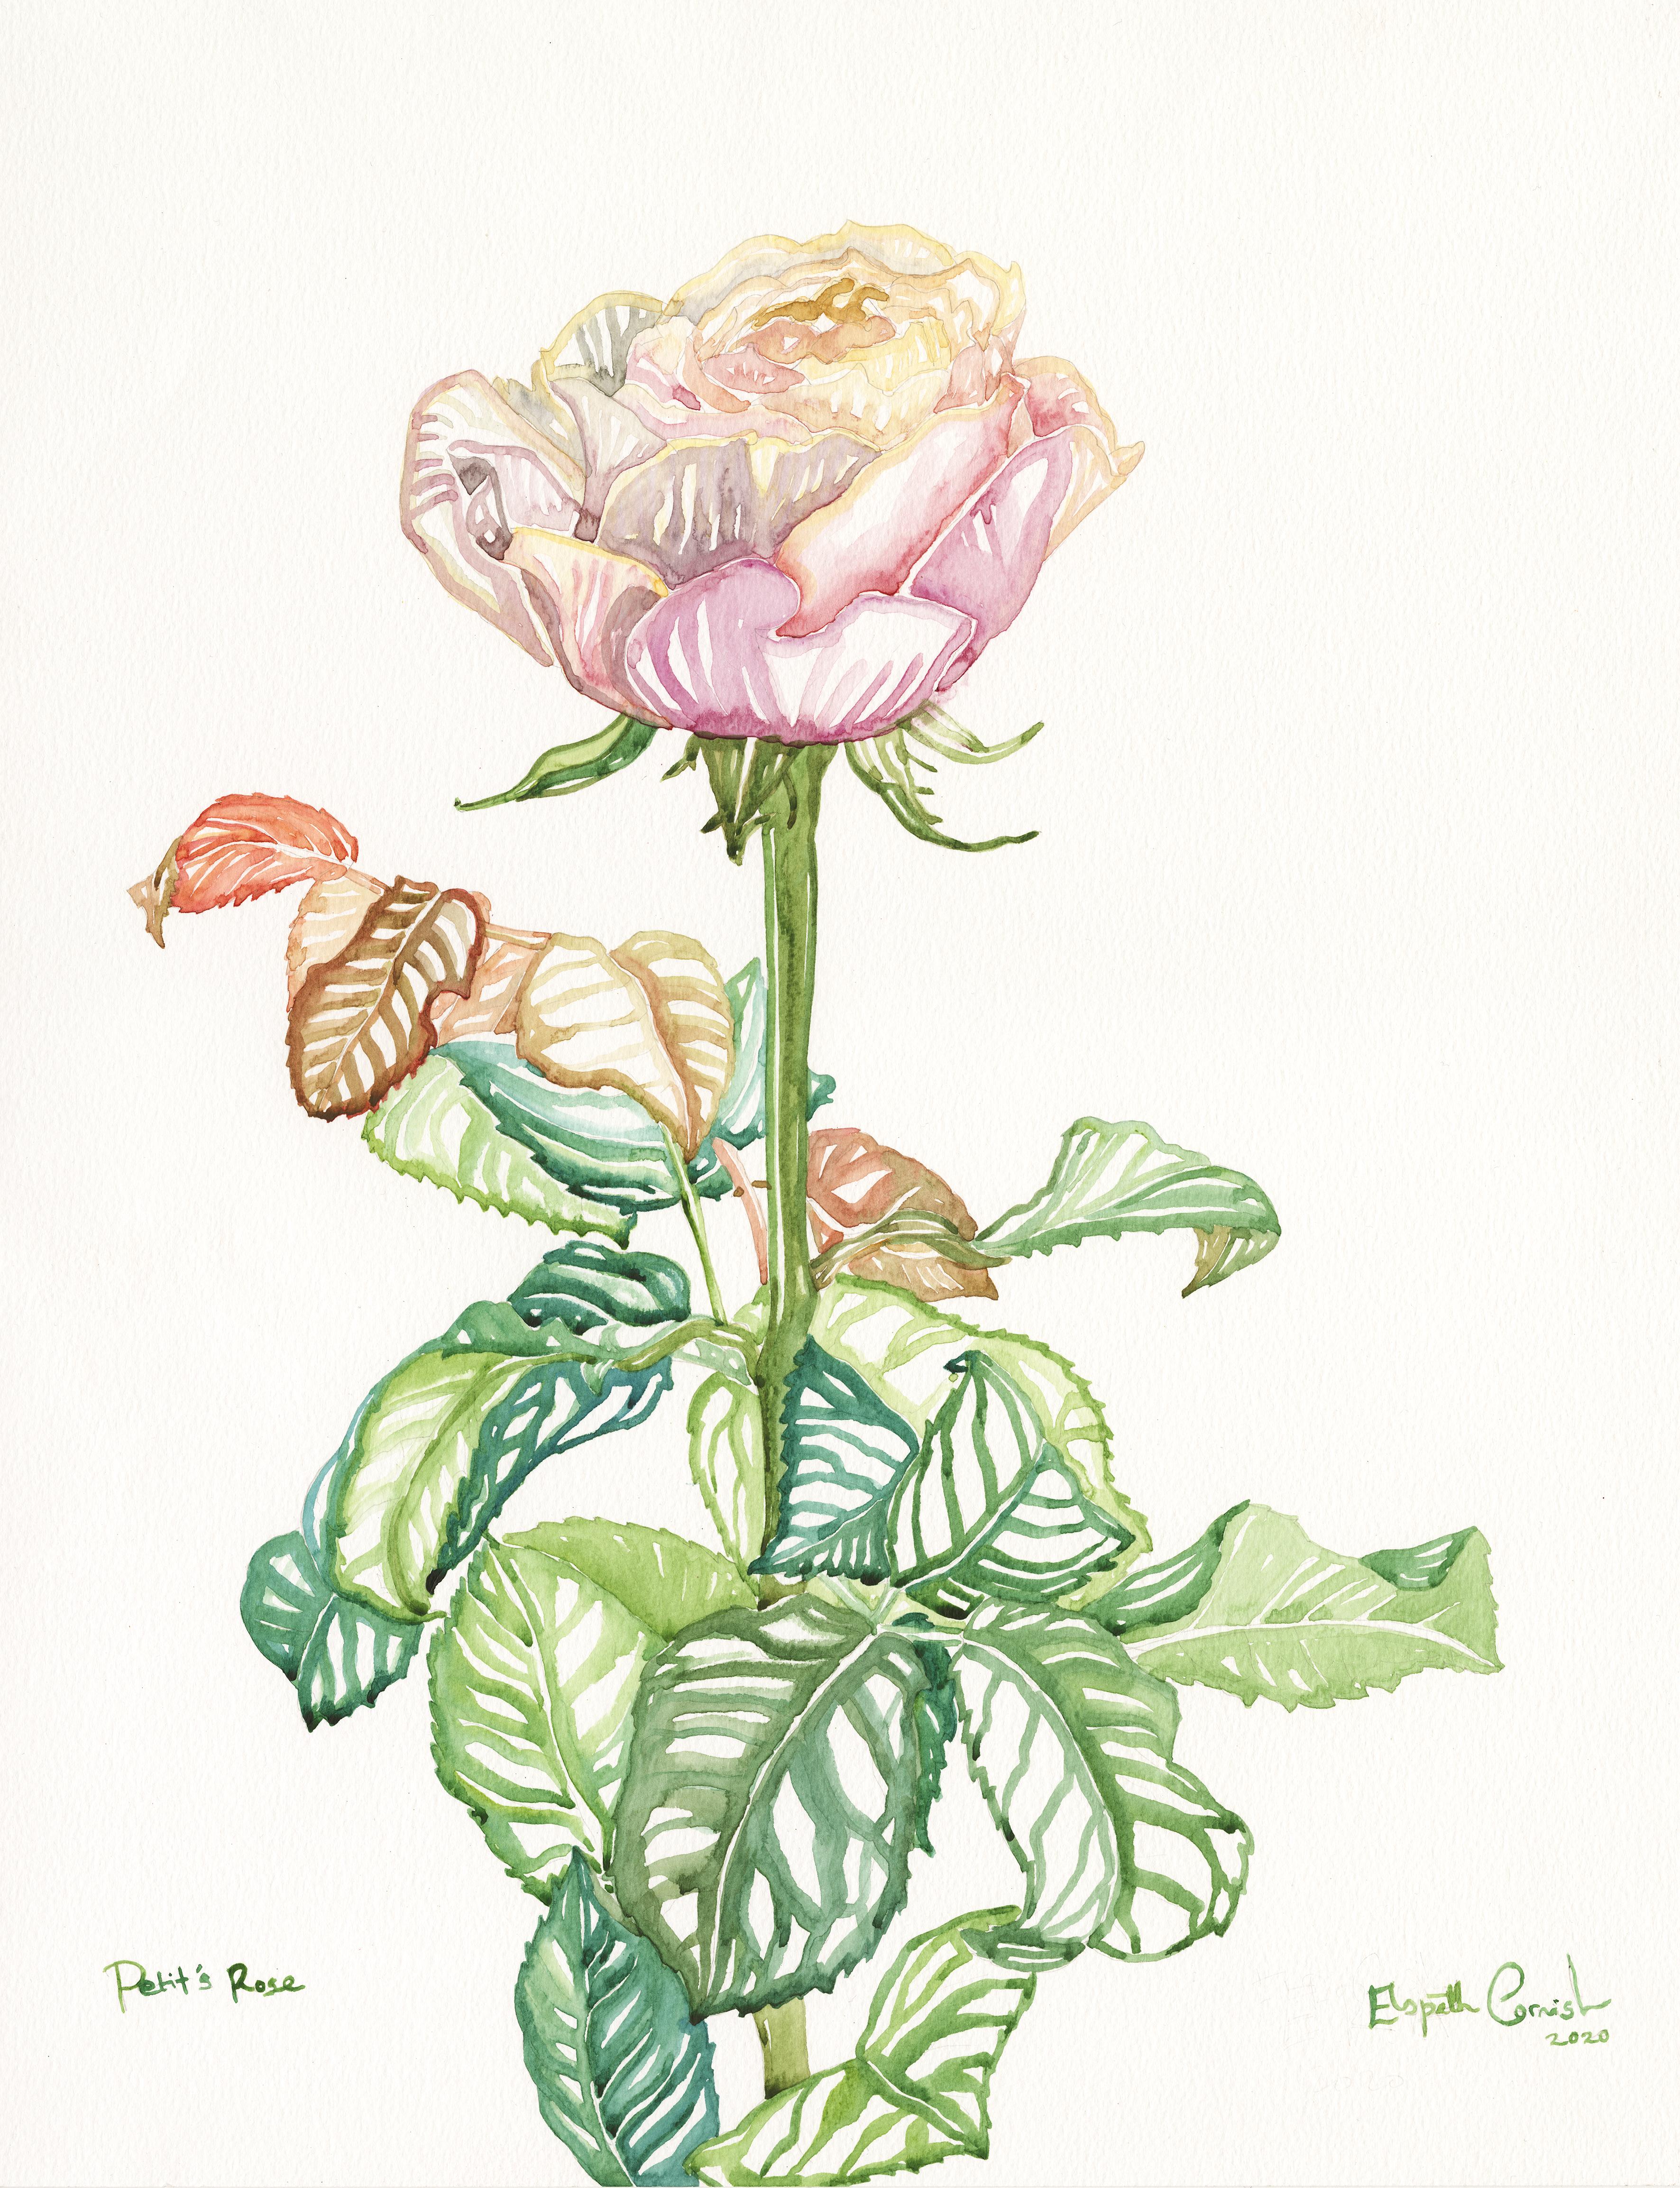 Petit's Rose